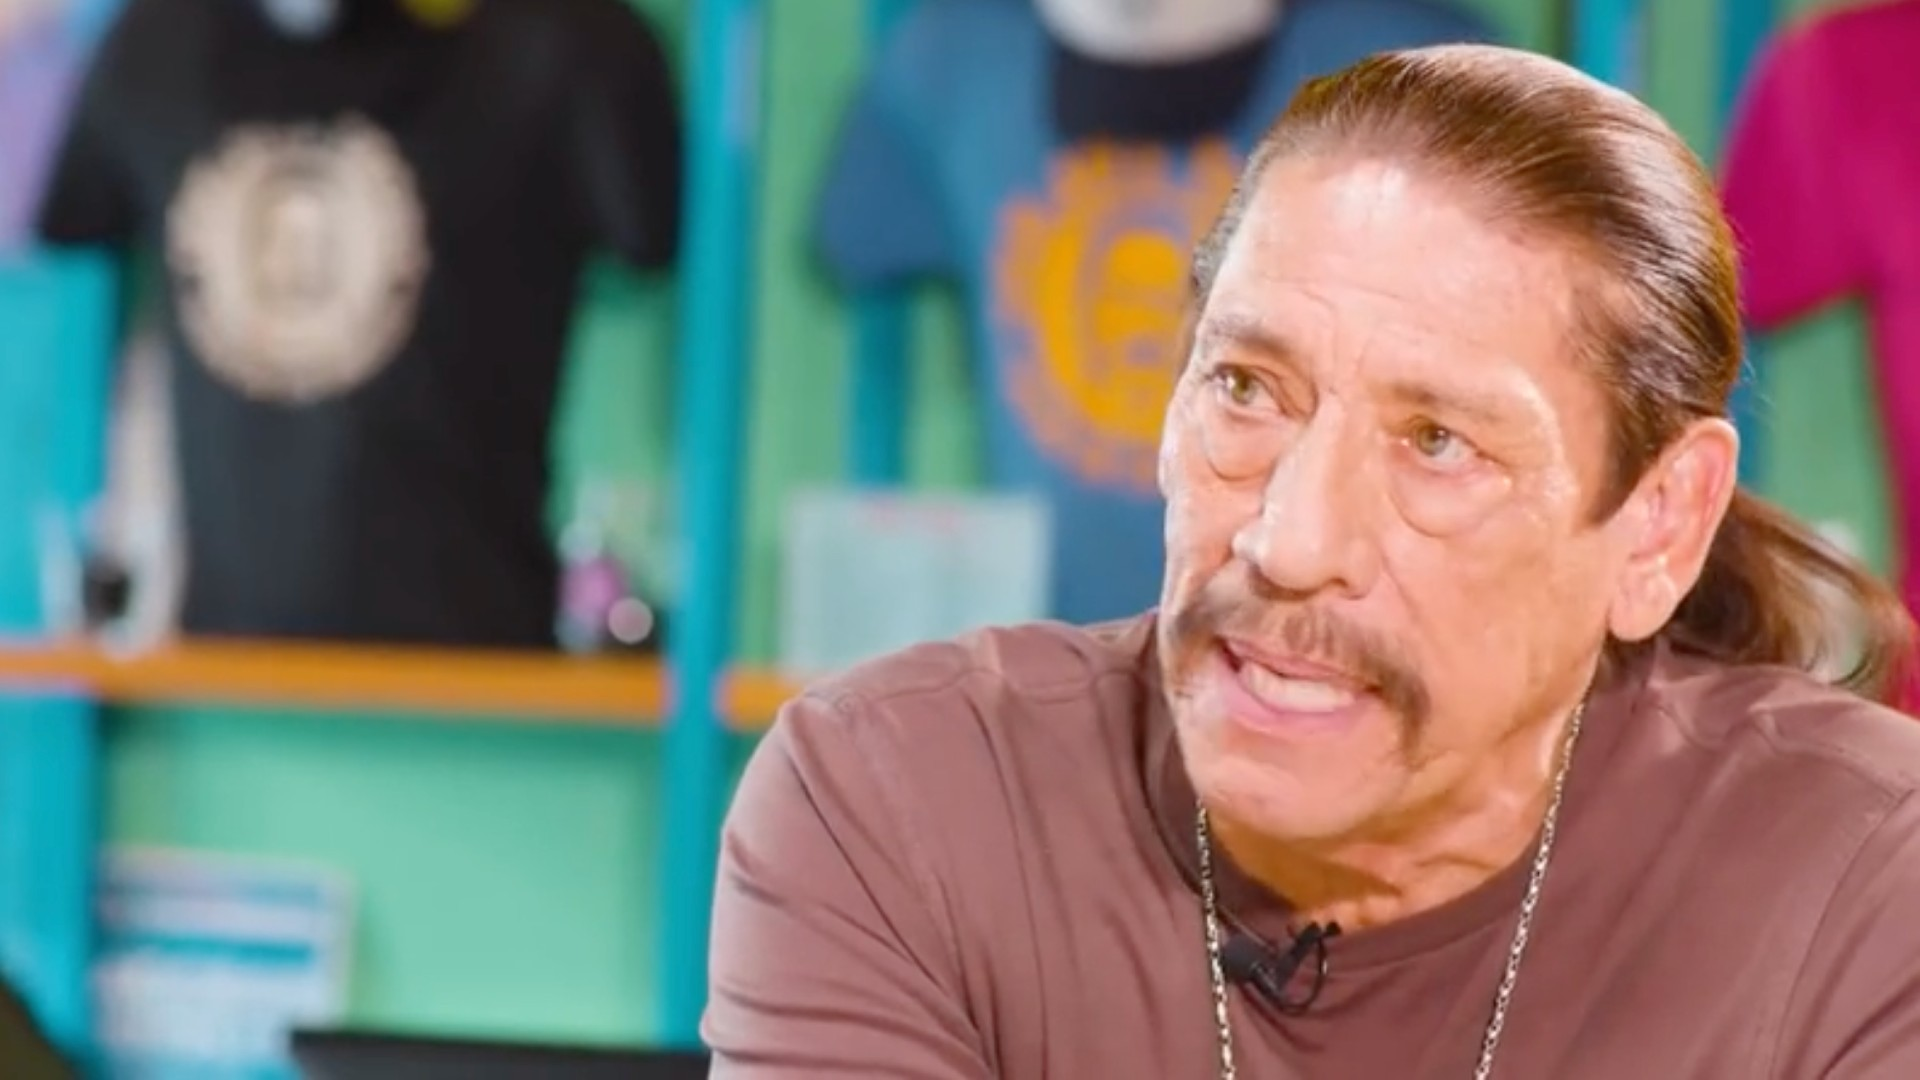 Danny Trejo is seen inside one of his Trejo's Tacos locations. (KTLA)